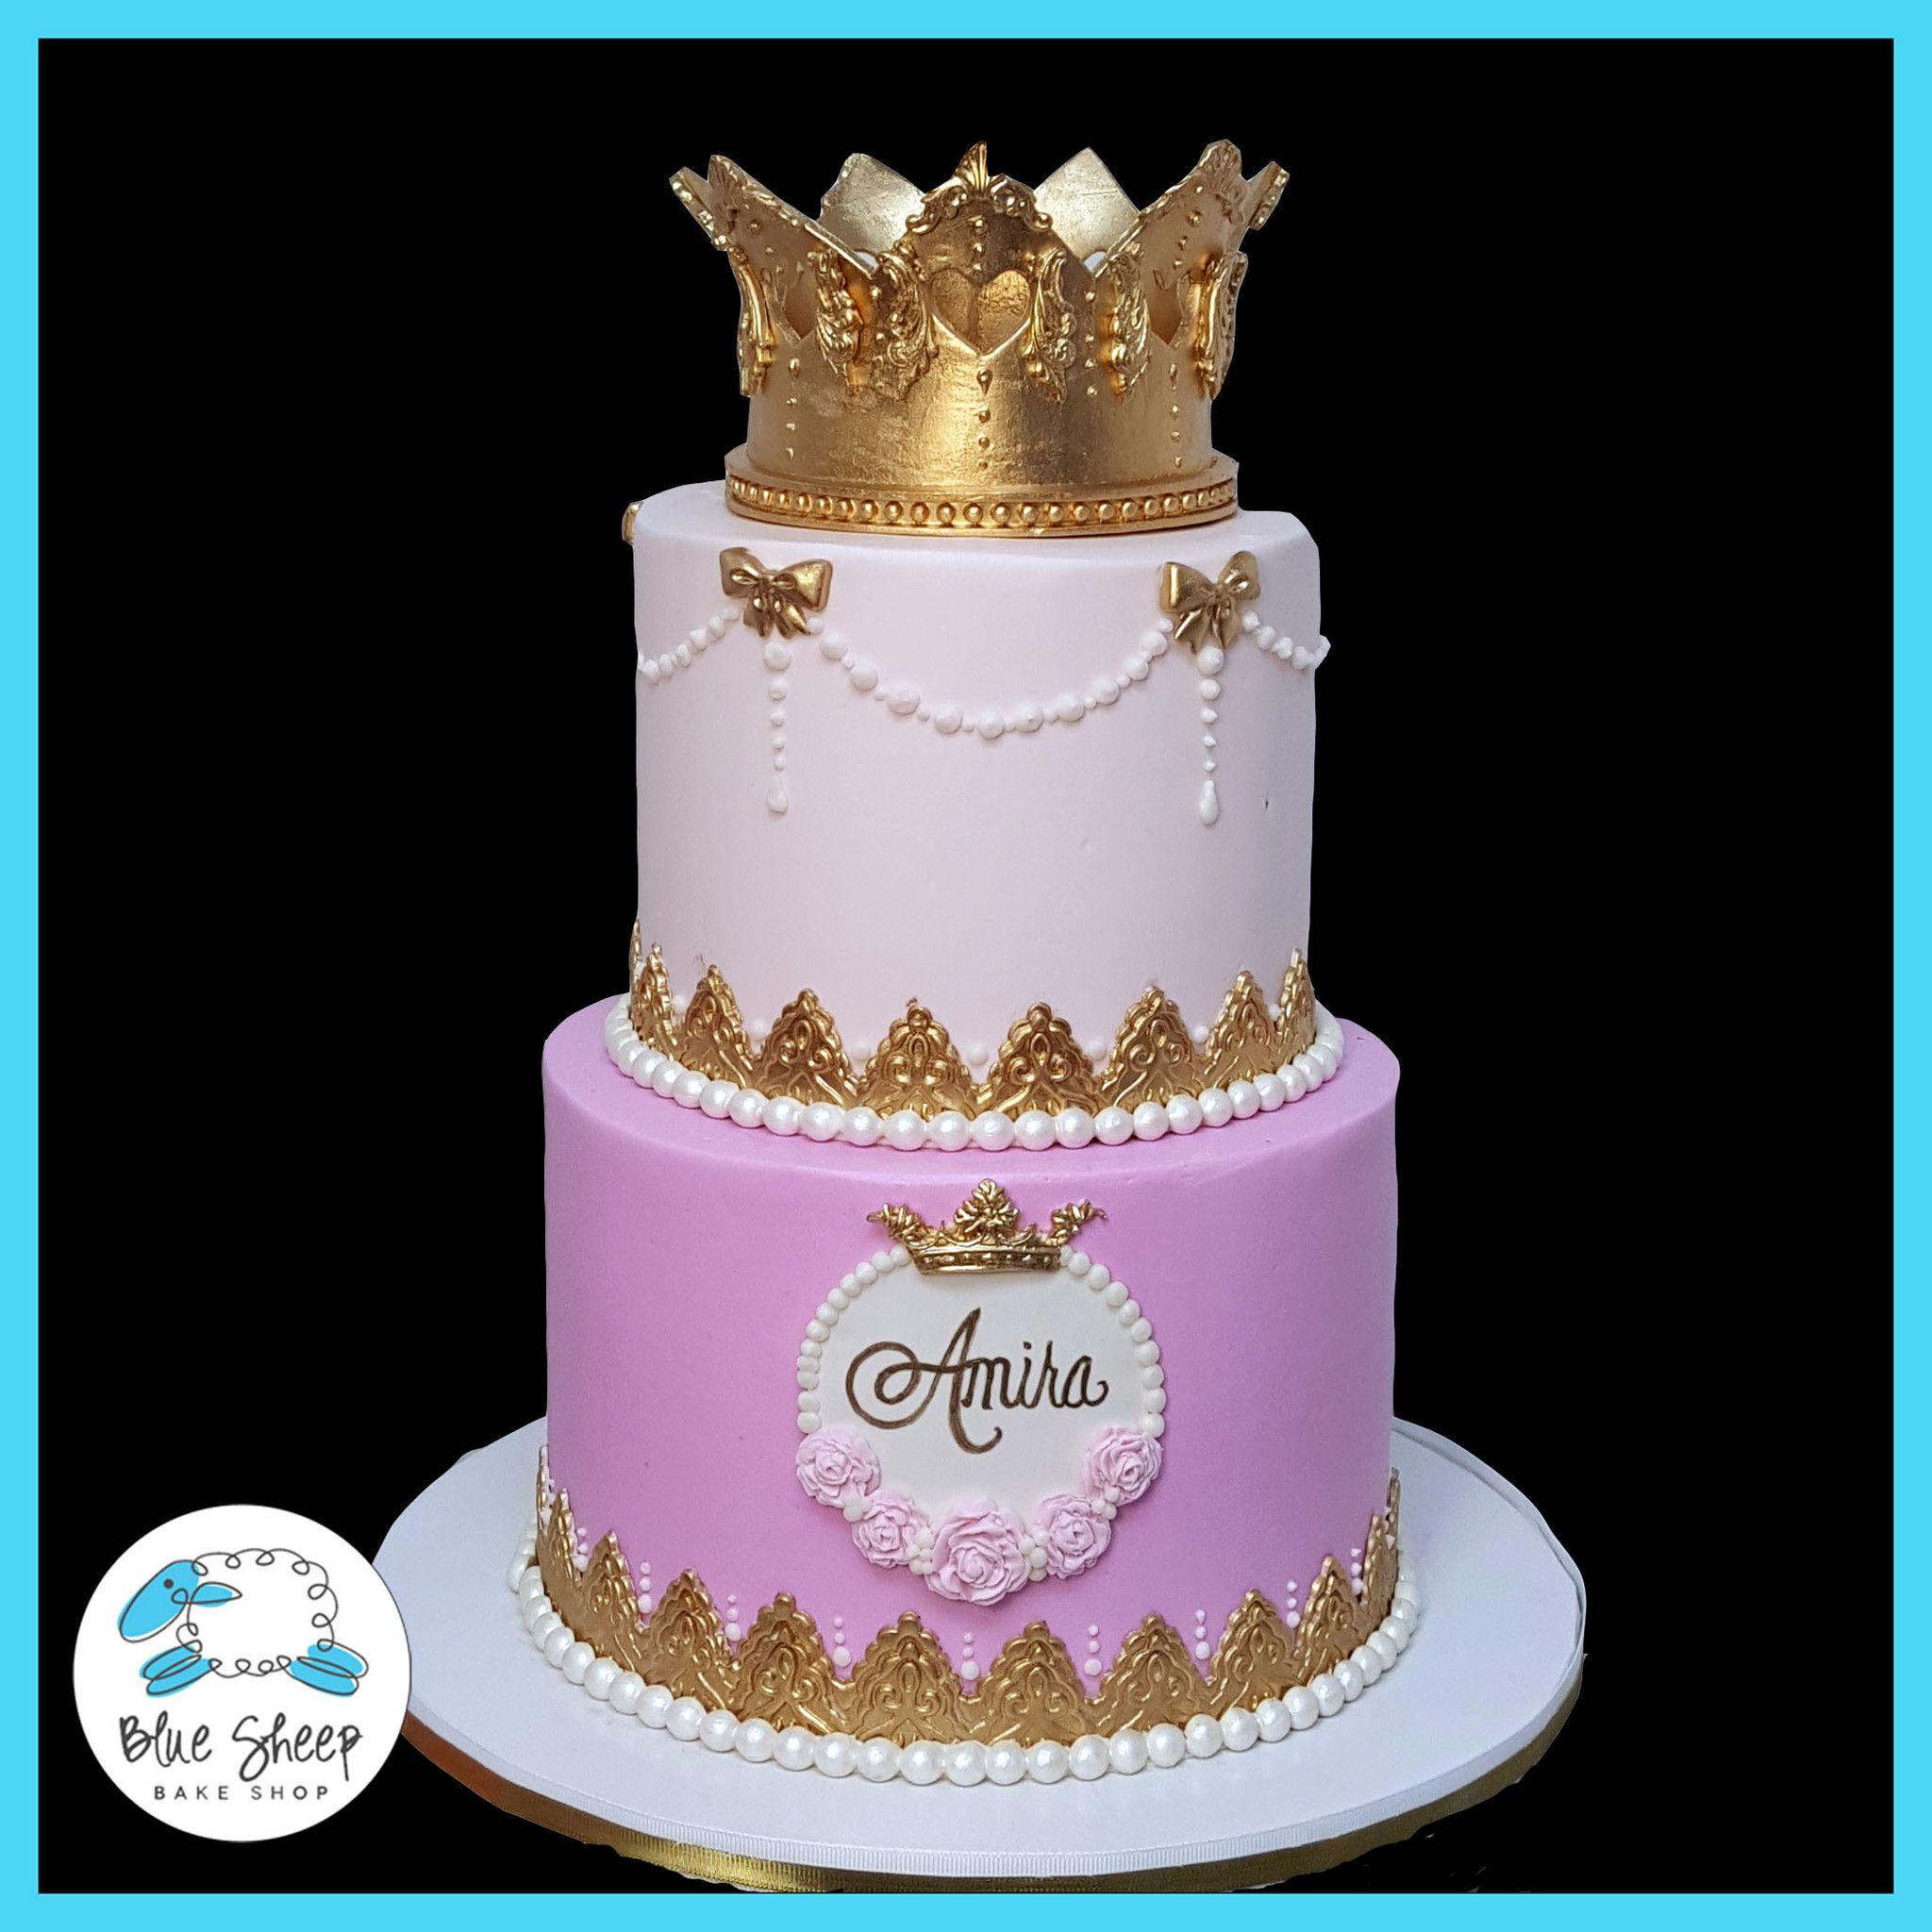 Amira S Princess 1st Birthday Cake 1st Birthday Princess 1st Birthday Cake Buttercream Wedding Cake